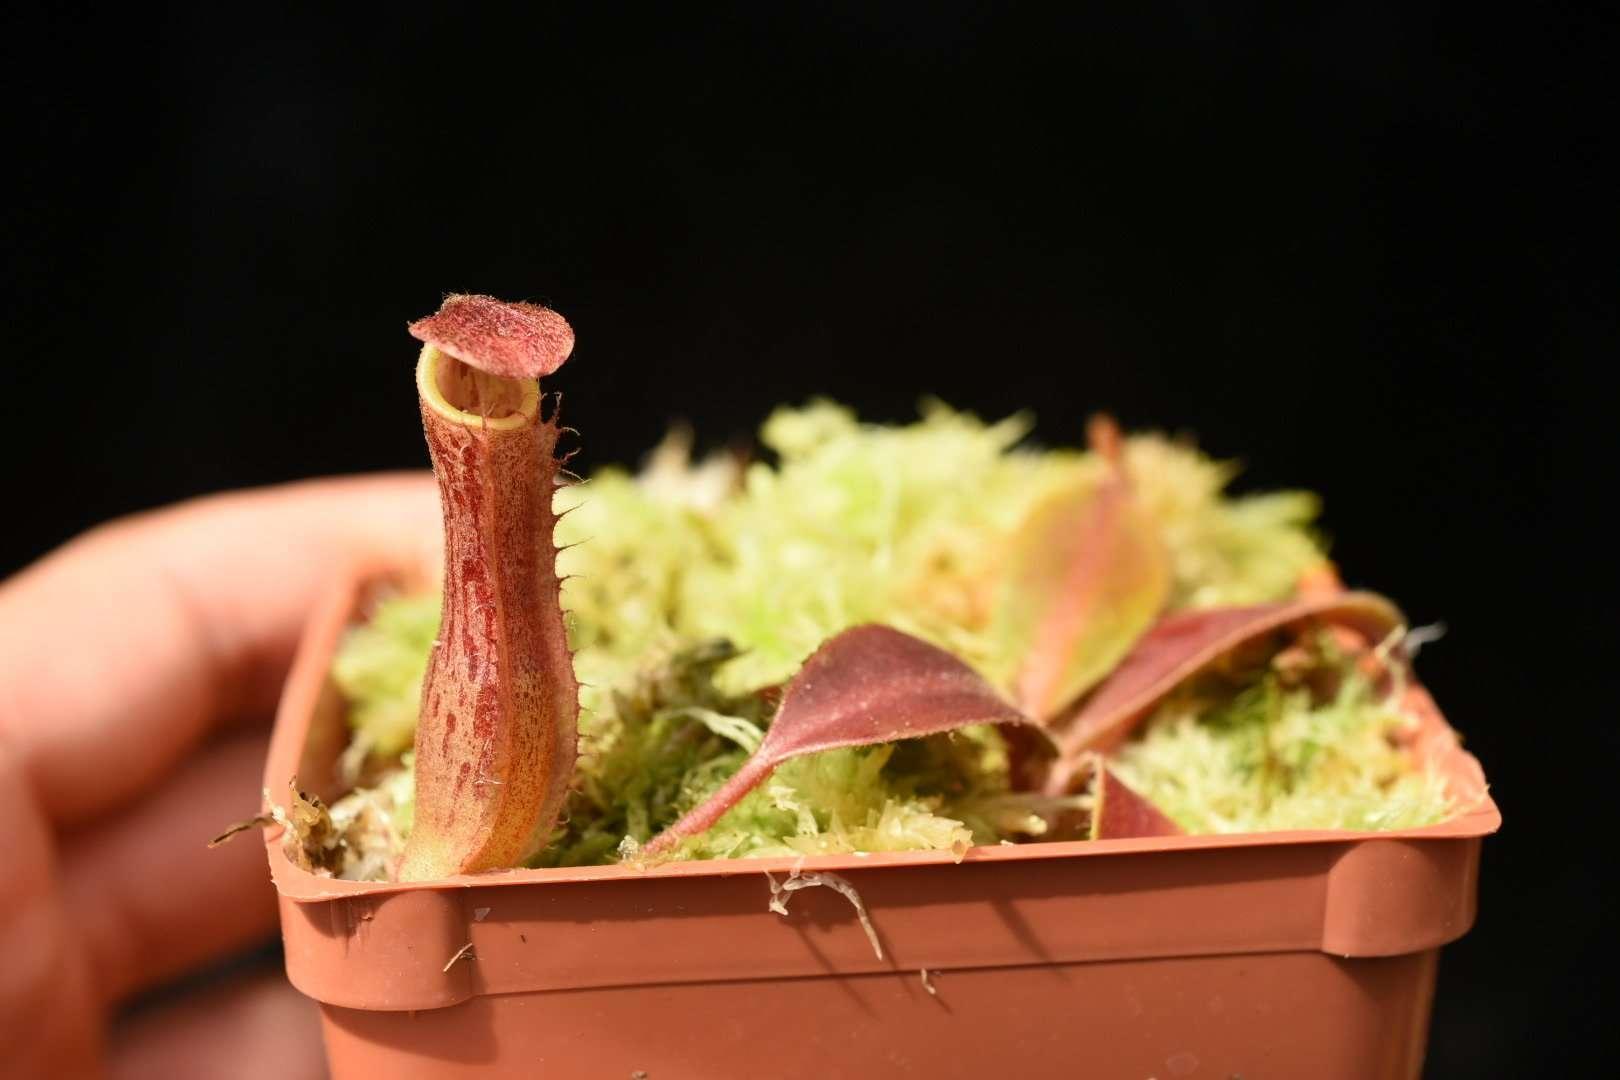 Nepenthes boschiana x veitchii Candy Stripe